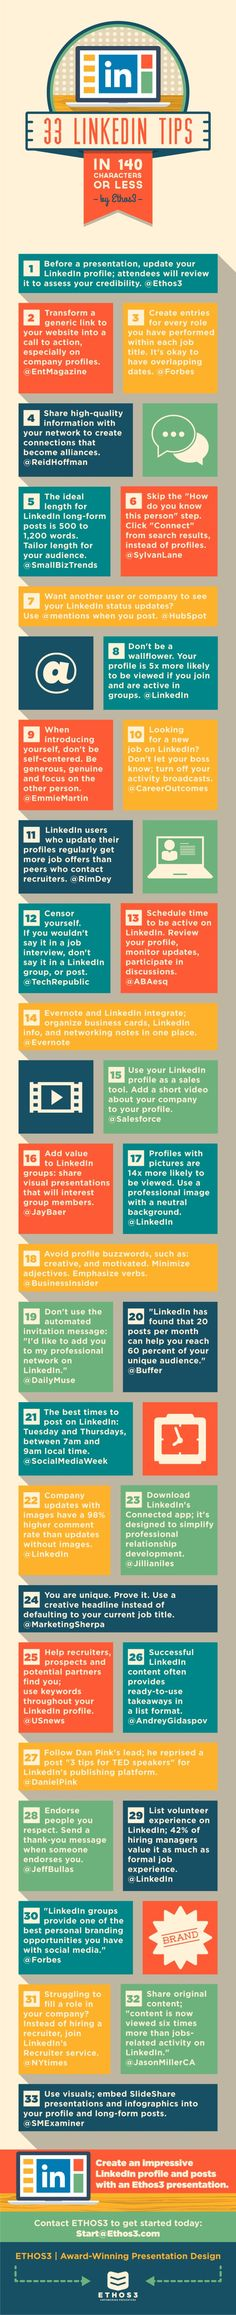 33 LinkedIn Tips, in 140 characters or less - #infographic #LinkedIn #socialmedia